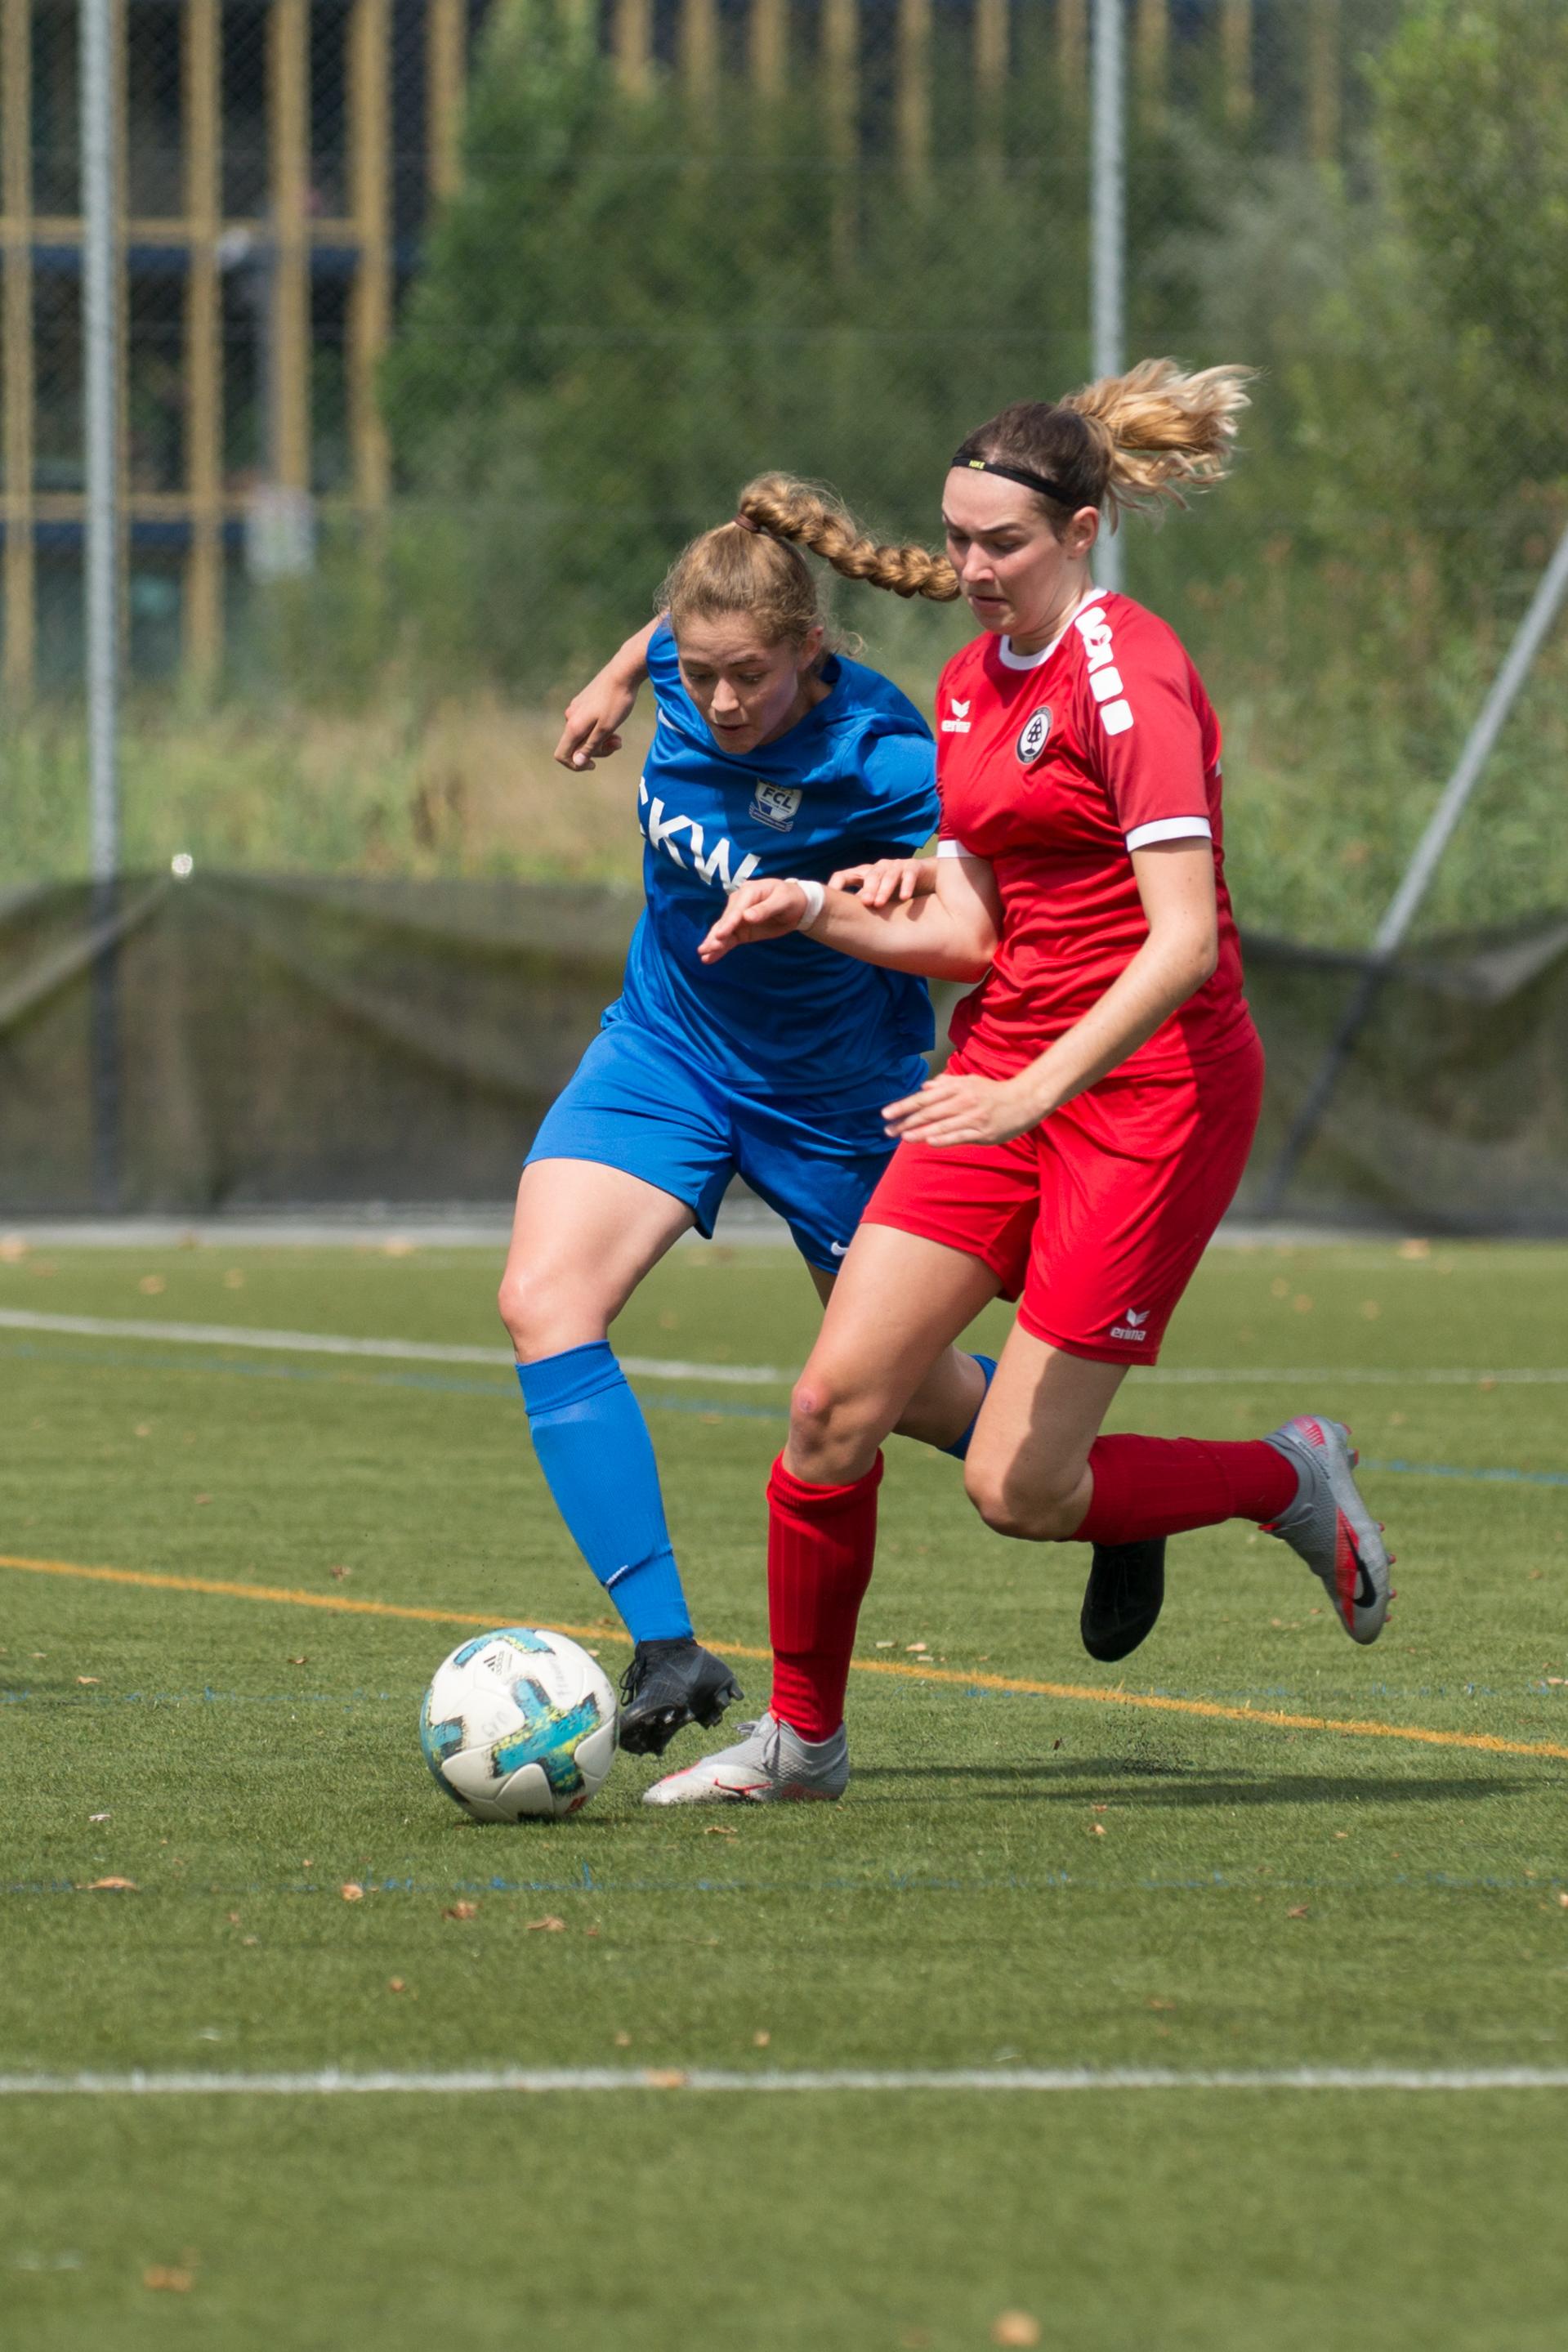 U19: FCL-FC Mohren Dornbirn 16-08-2020